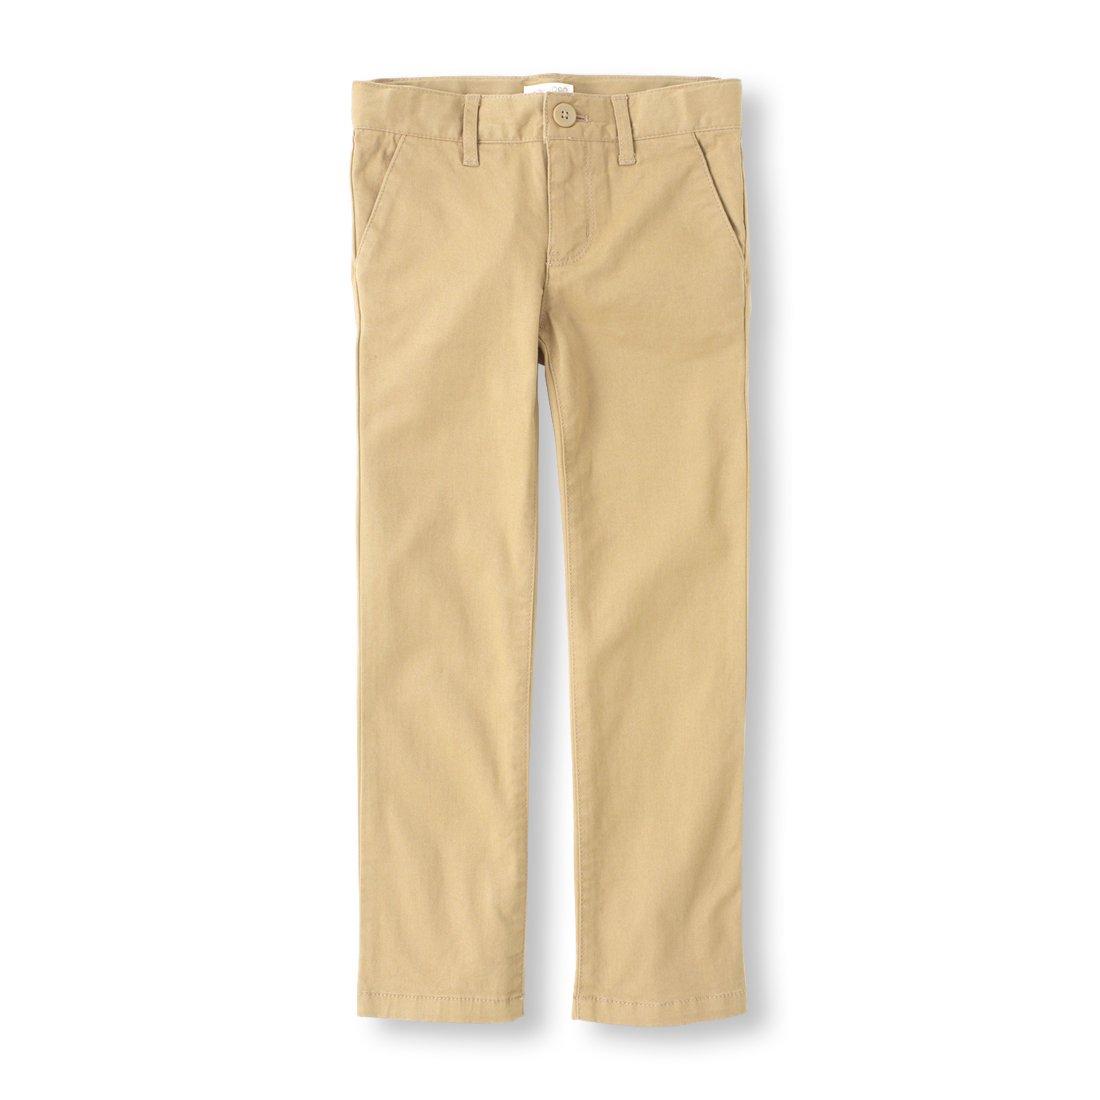 The Children's Place Big Girls' Uniform Skinny Pant, Sandy, 16 by The Children's Place (Image #1)